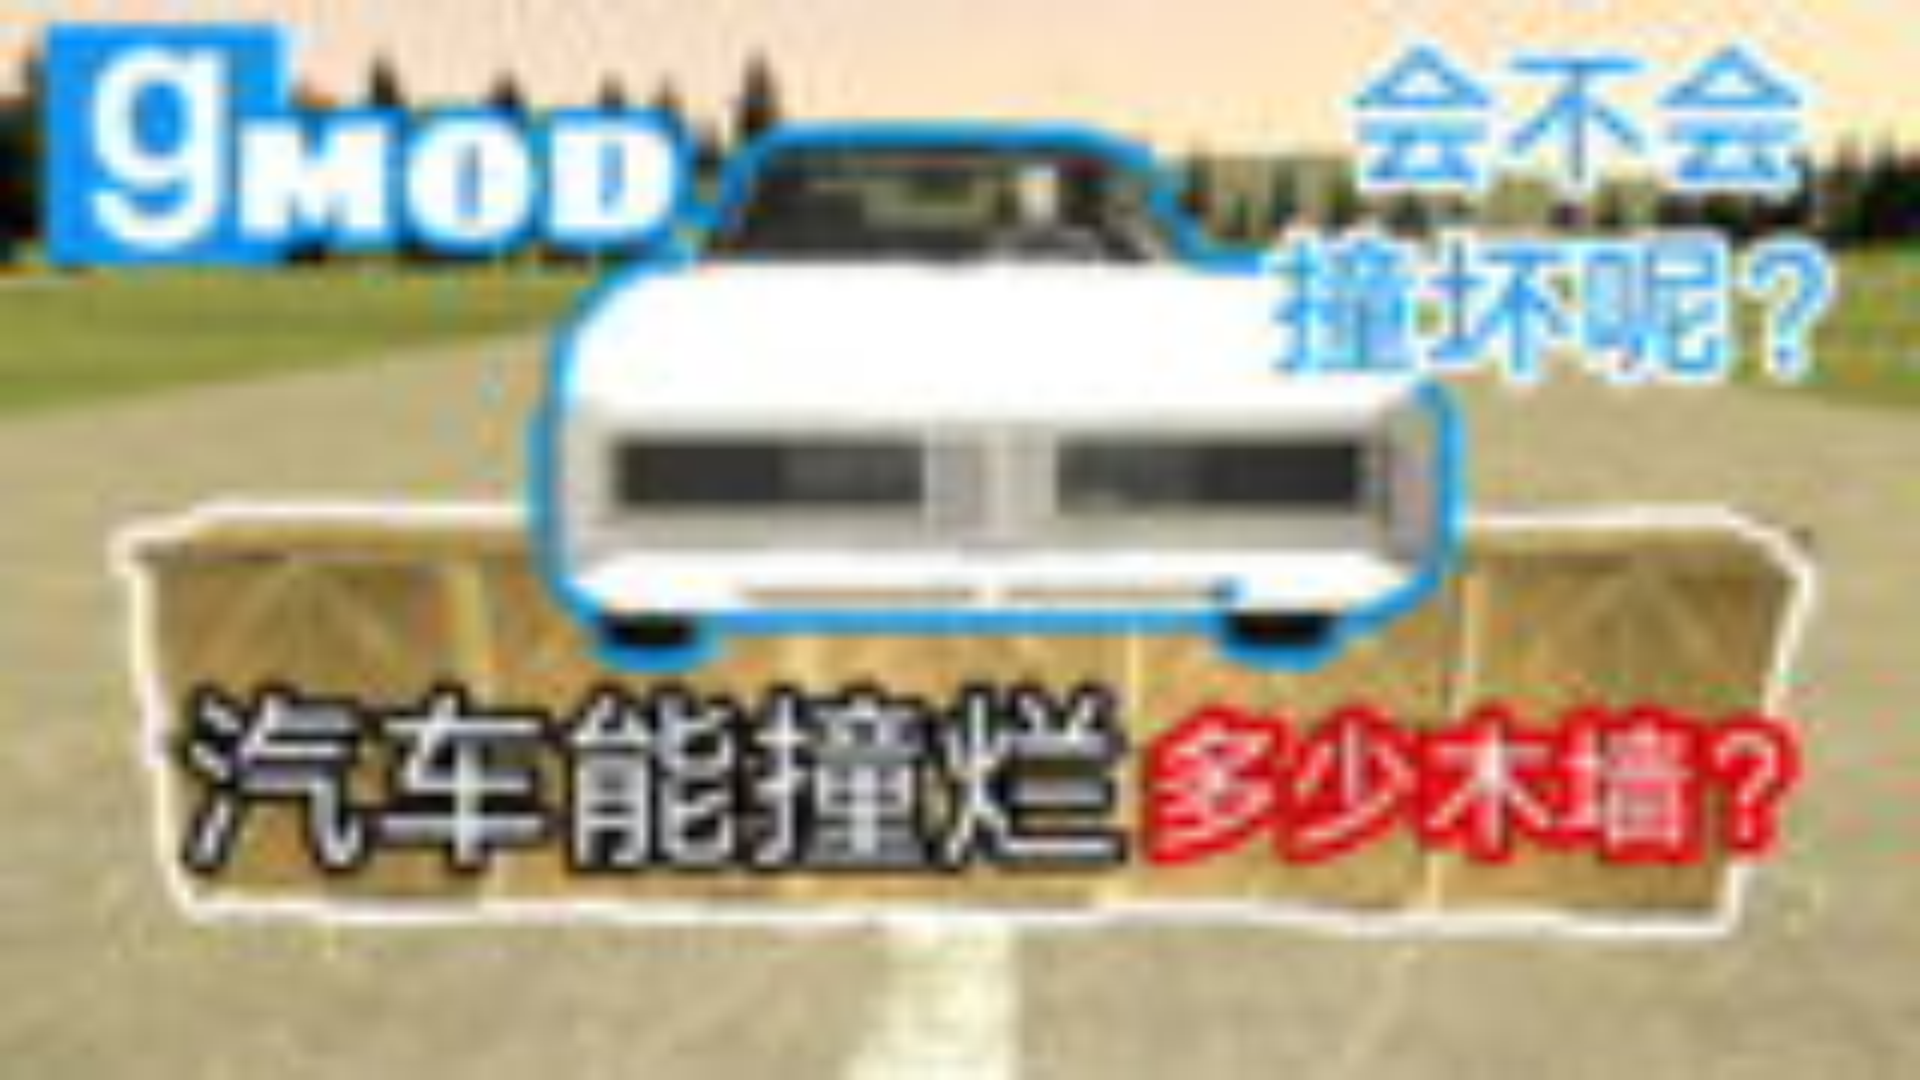 【Gmod】汽车能撞烂多少木墙?硬核实验